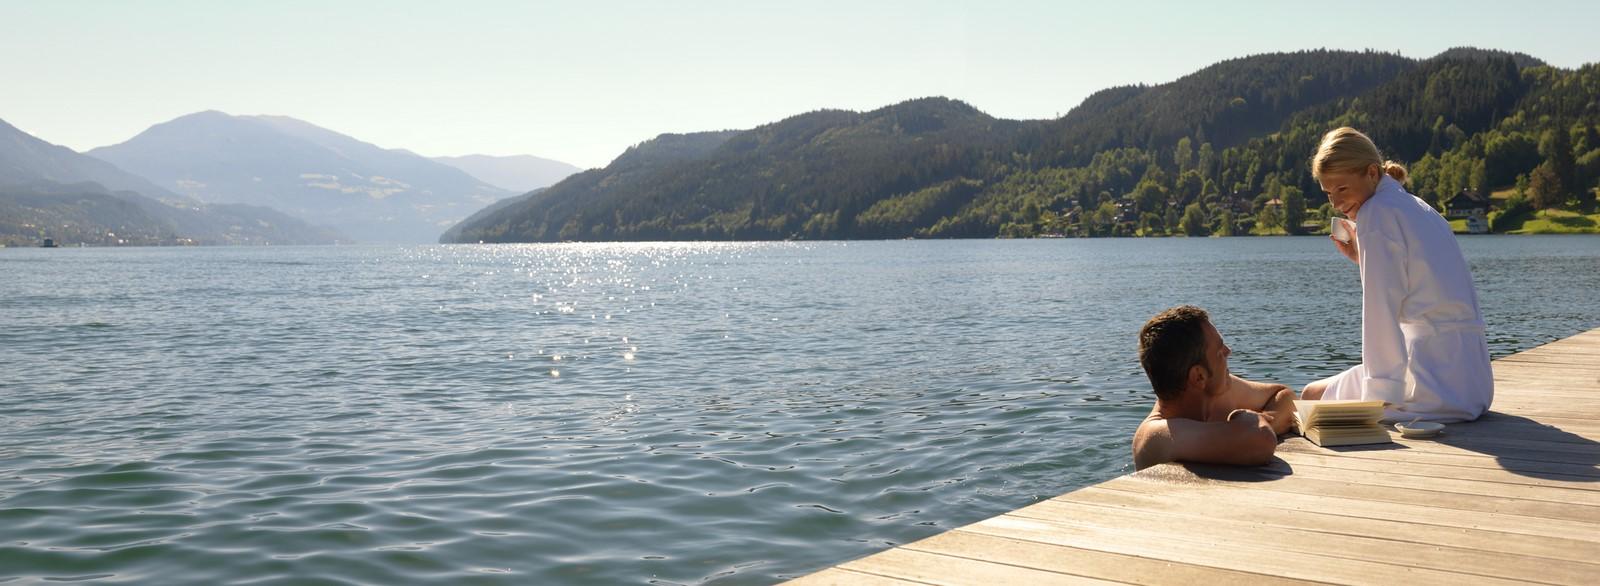 Entspannung pur im Hotel KOLLERs am Millstätter See in Kärnten. (Foto KOLLERs)